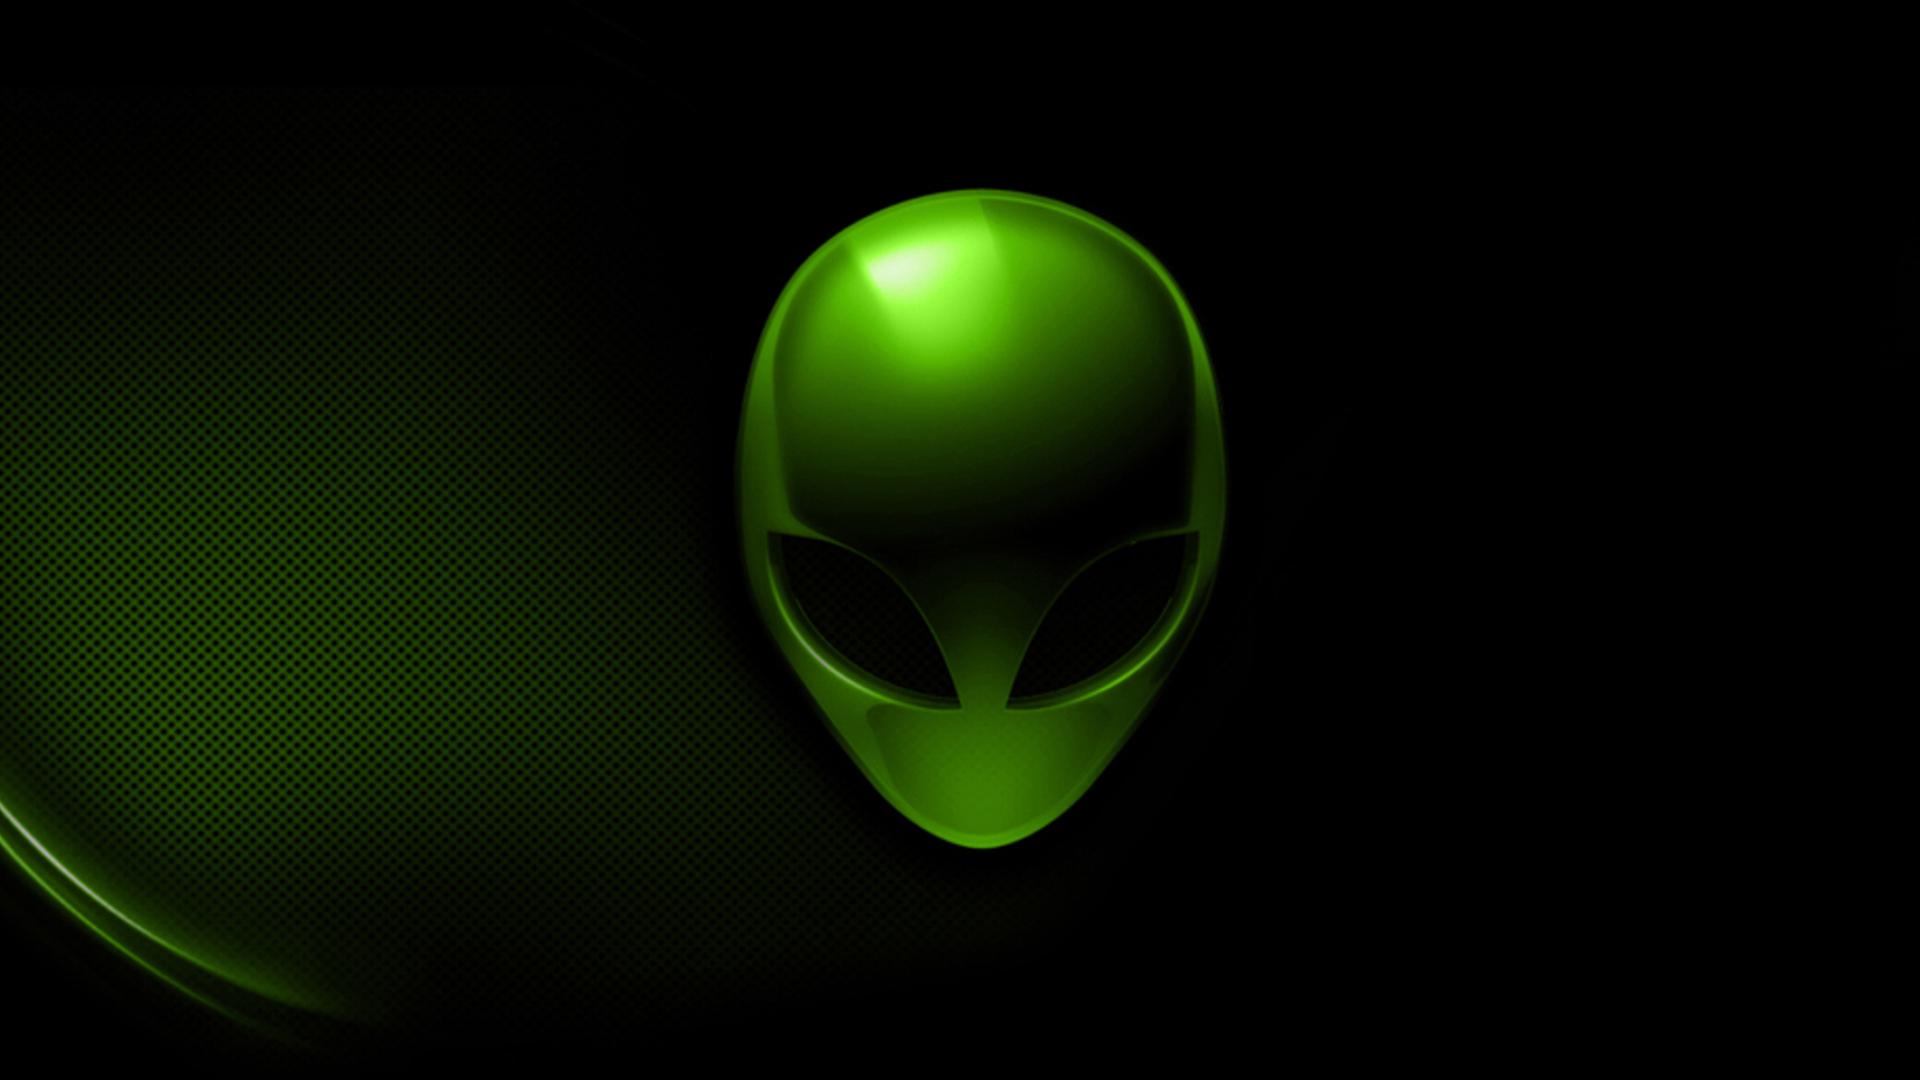 alienware dark green 04 wallpaper hd